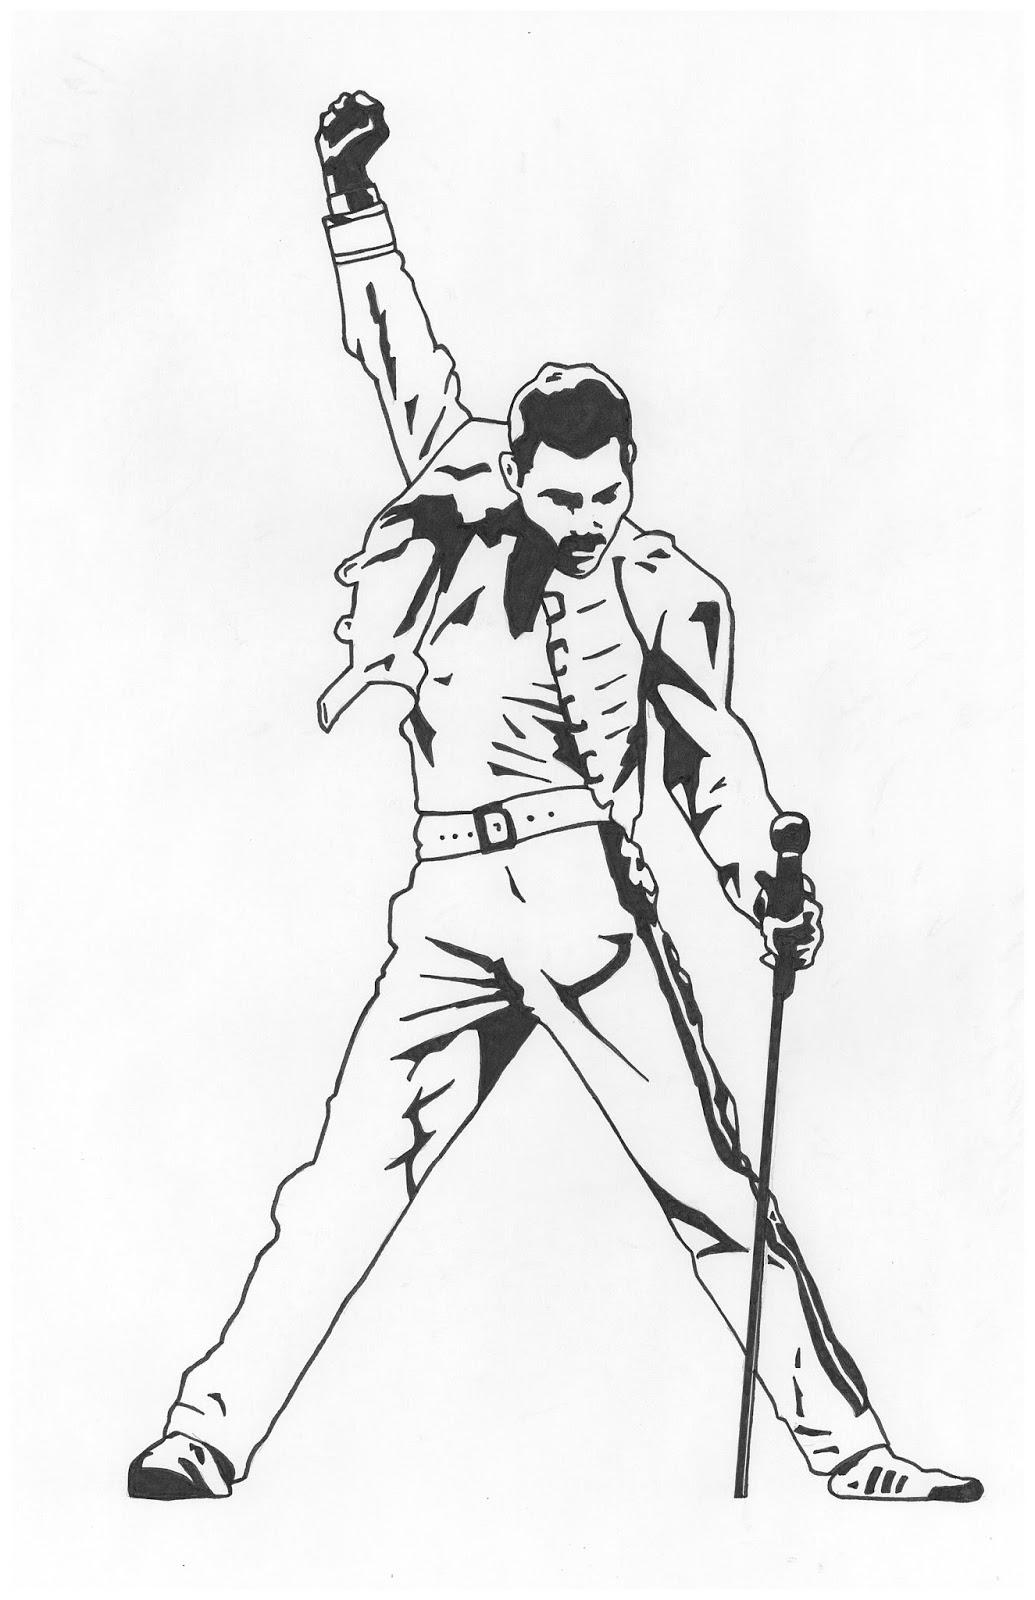 Freddie mercury pose silhouette